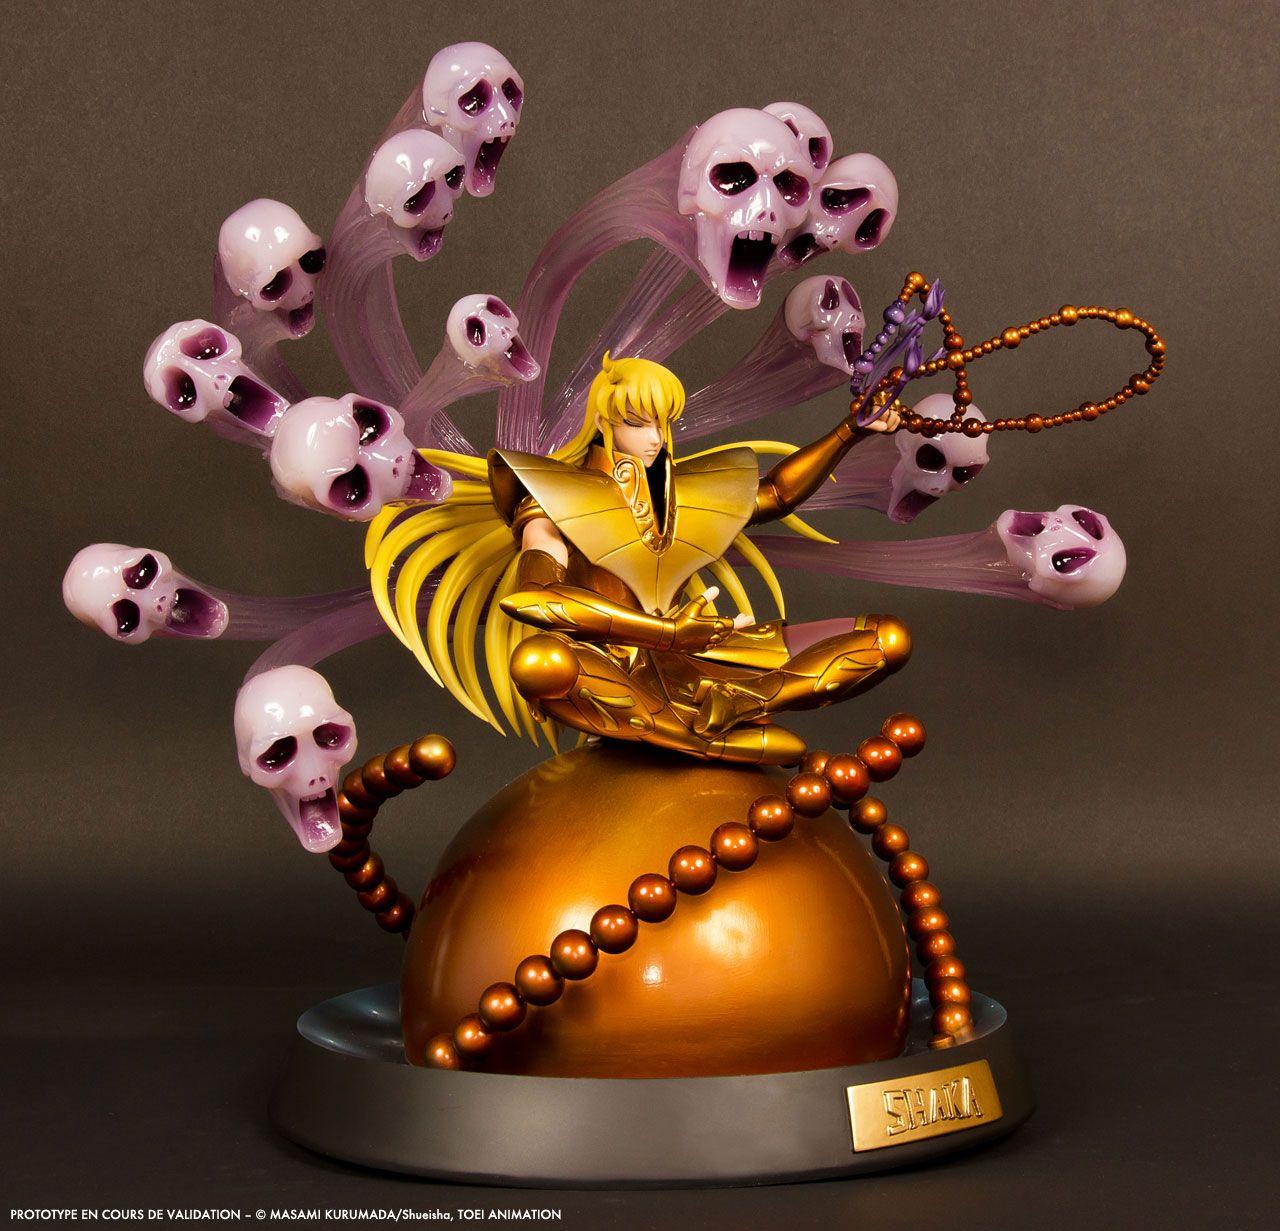 Pin By Victor Villaplana On My Favorite Pinterest Statue Saint Tsume Art Chunli Virgo Shaka Hqs Http Amznto